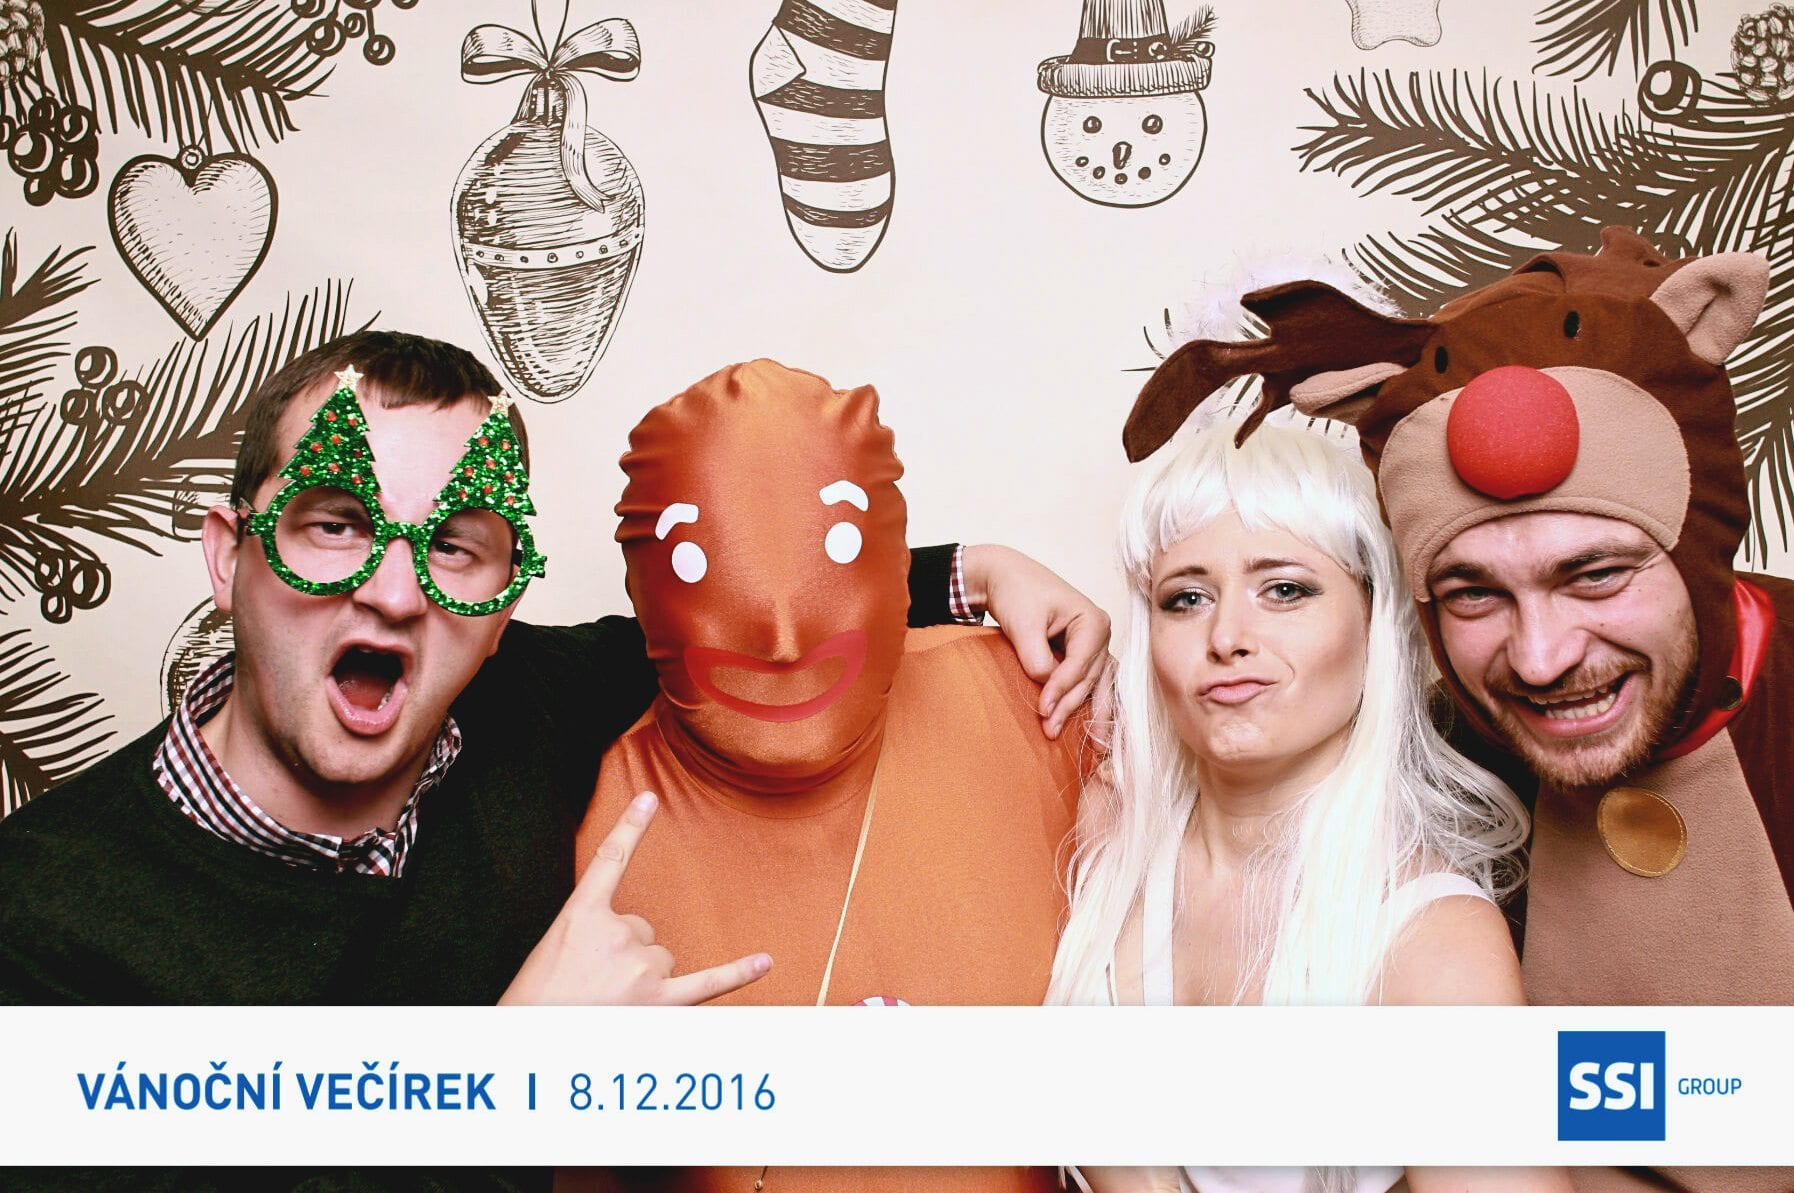 fotokoutek-ssi-group-vanocni-vecirek-8-12-2016-177713